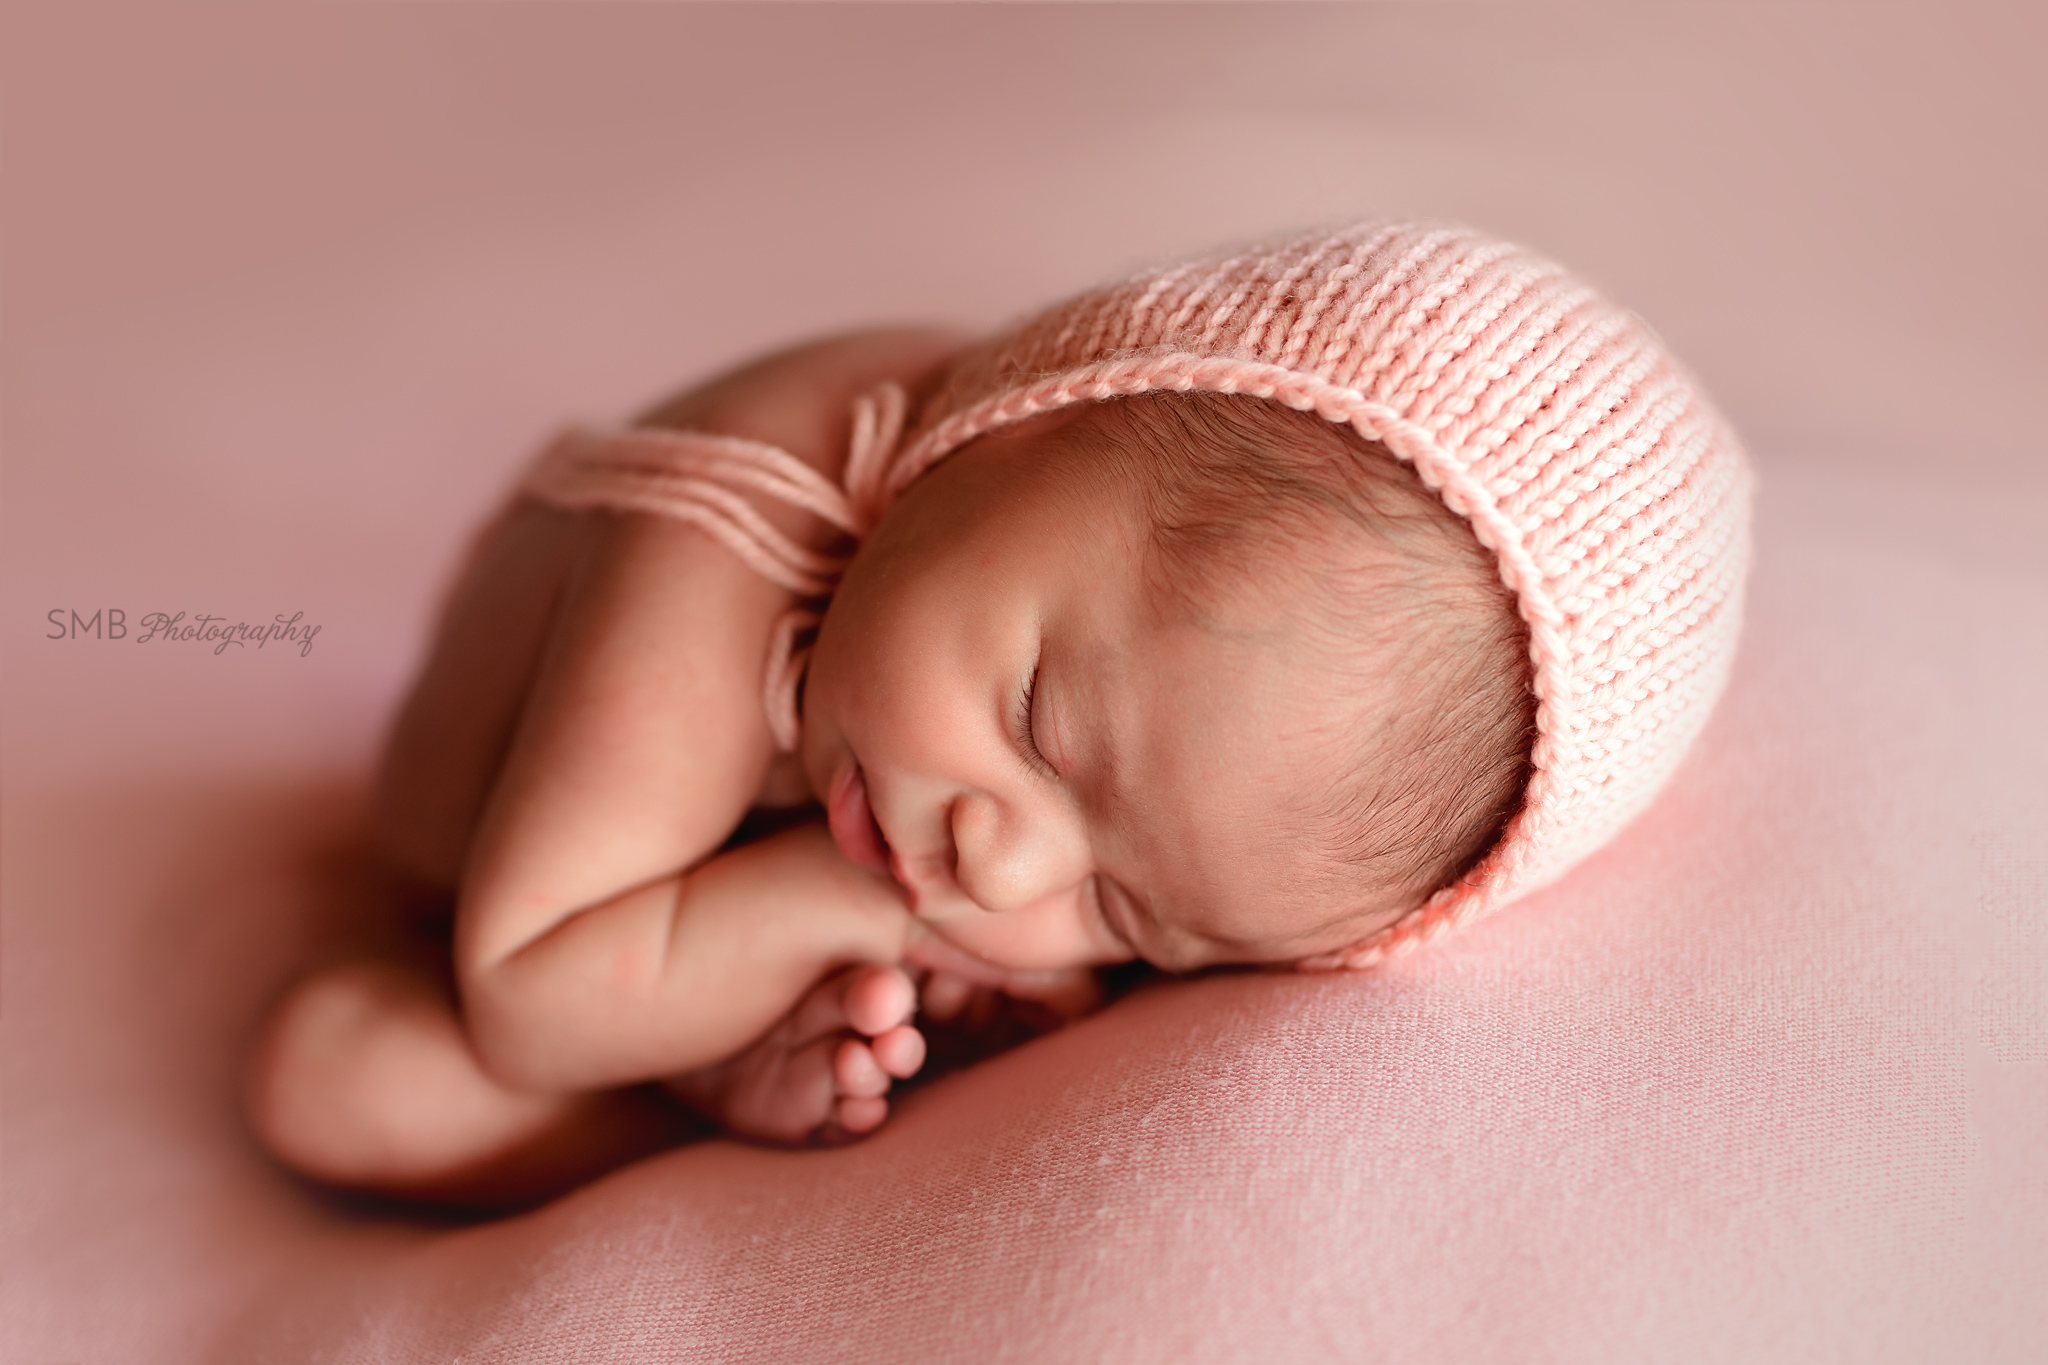 Newborn curled in womb like pose